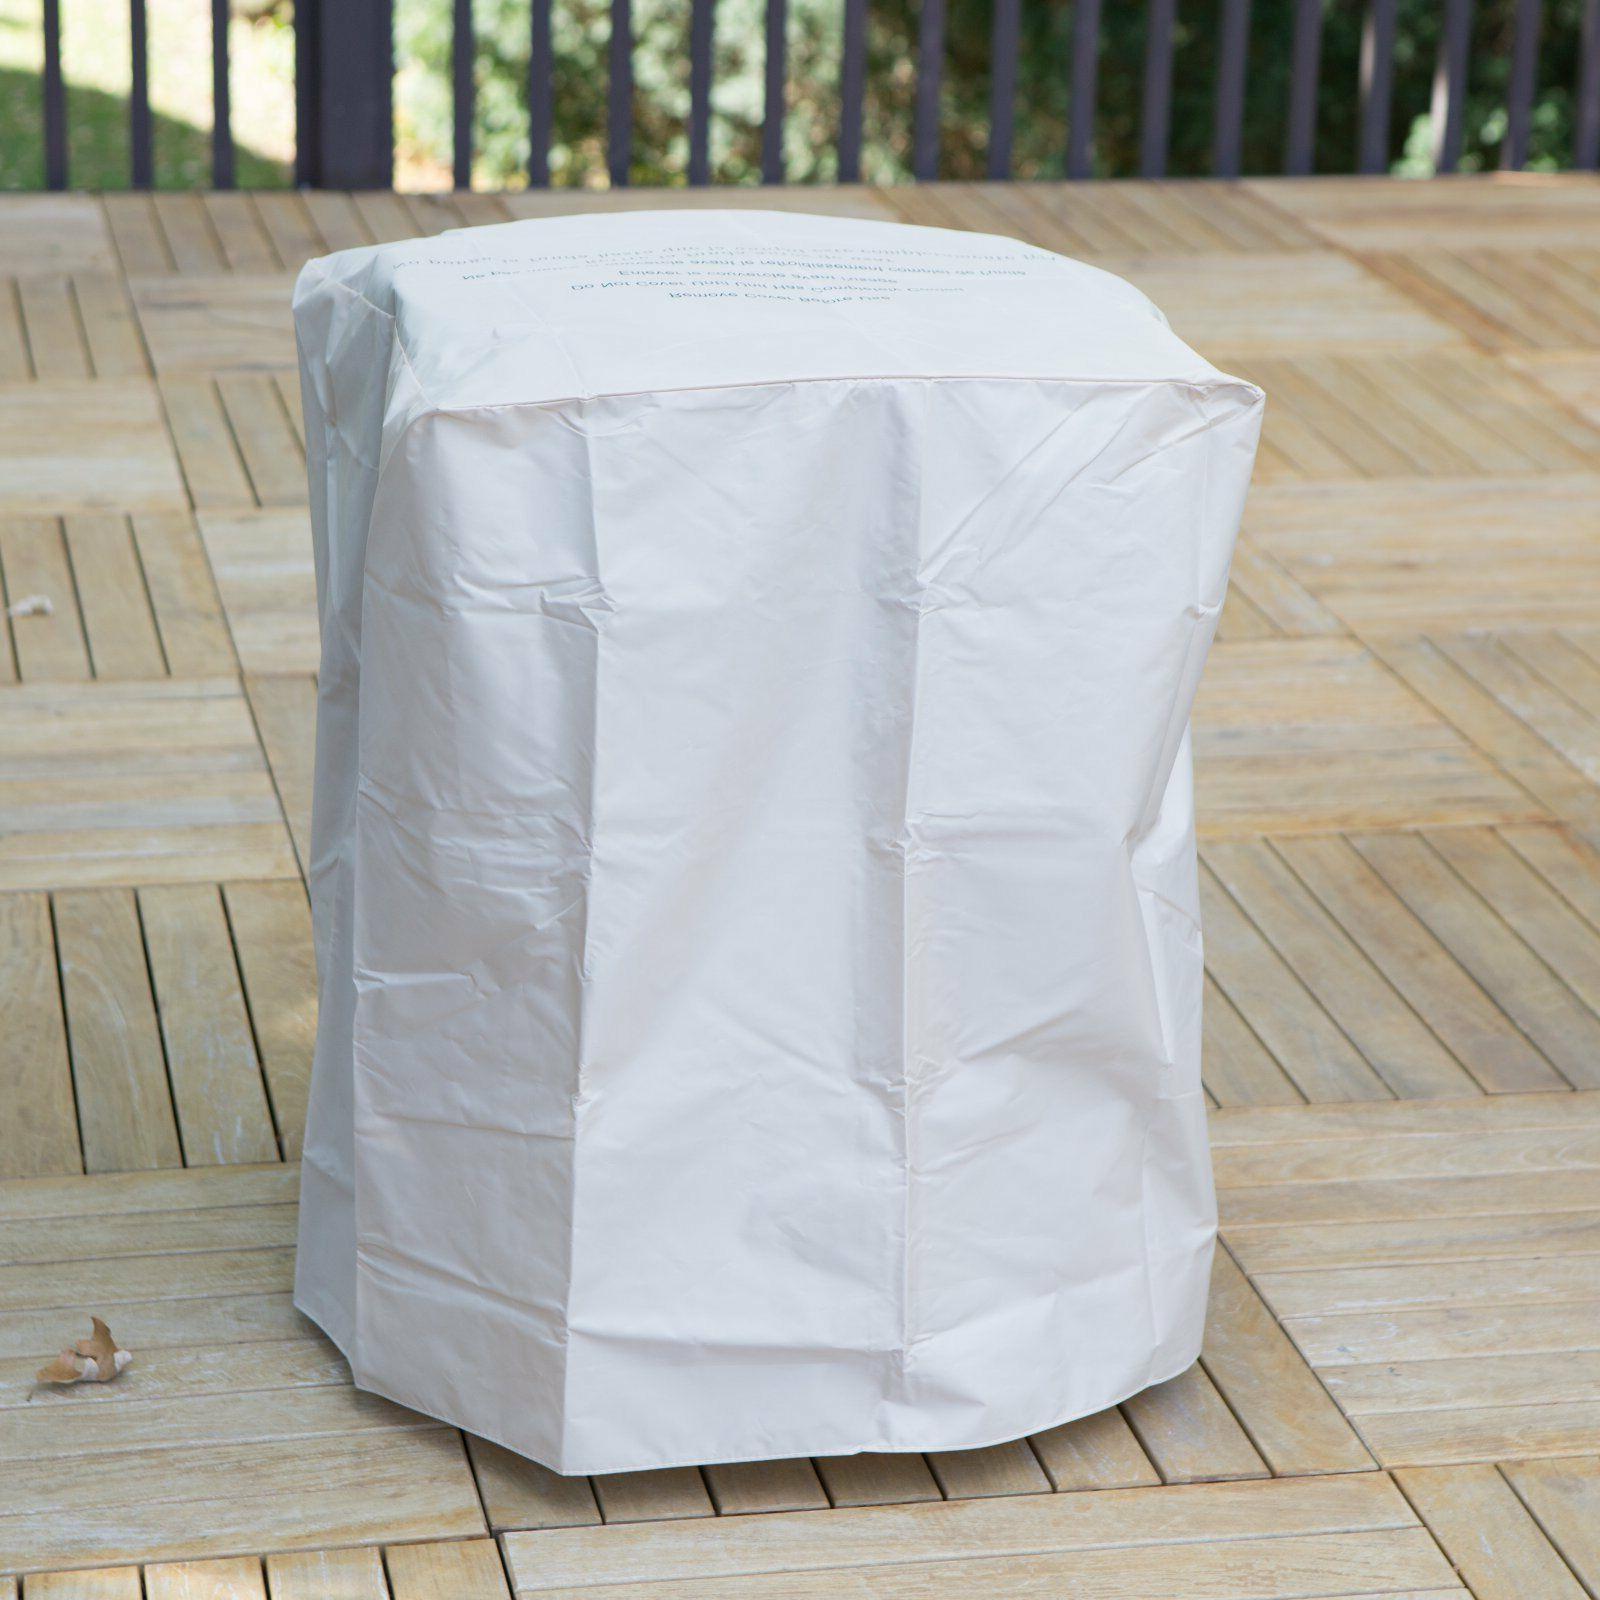 Propane Heater Fire Bowl Pit Furniture Cover